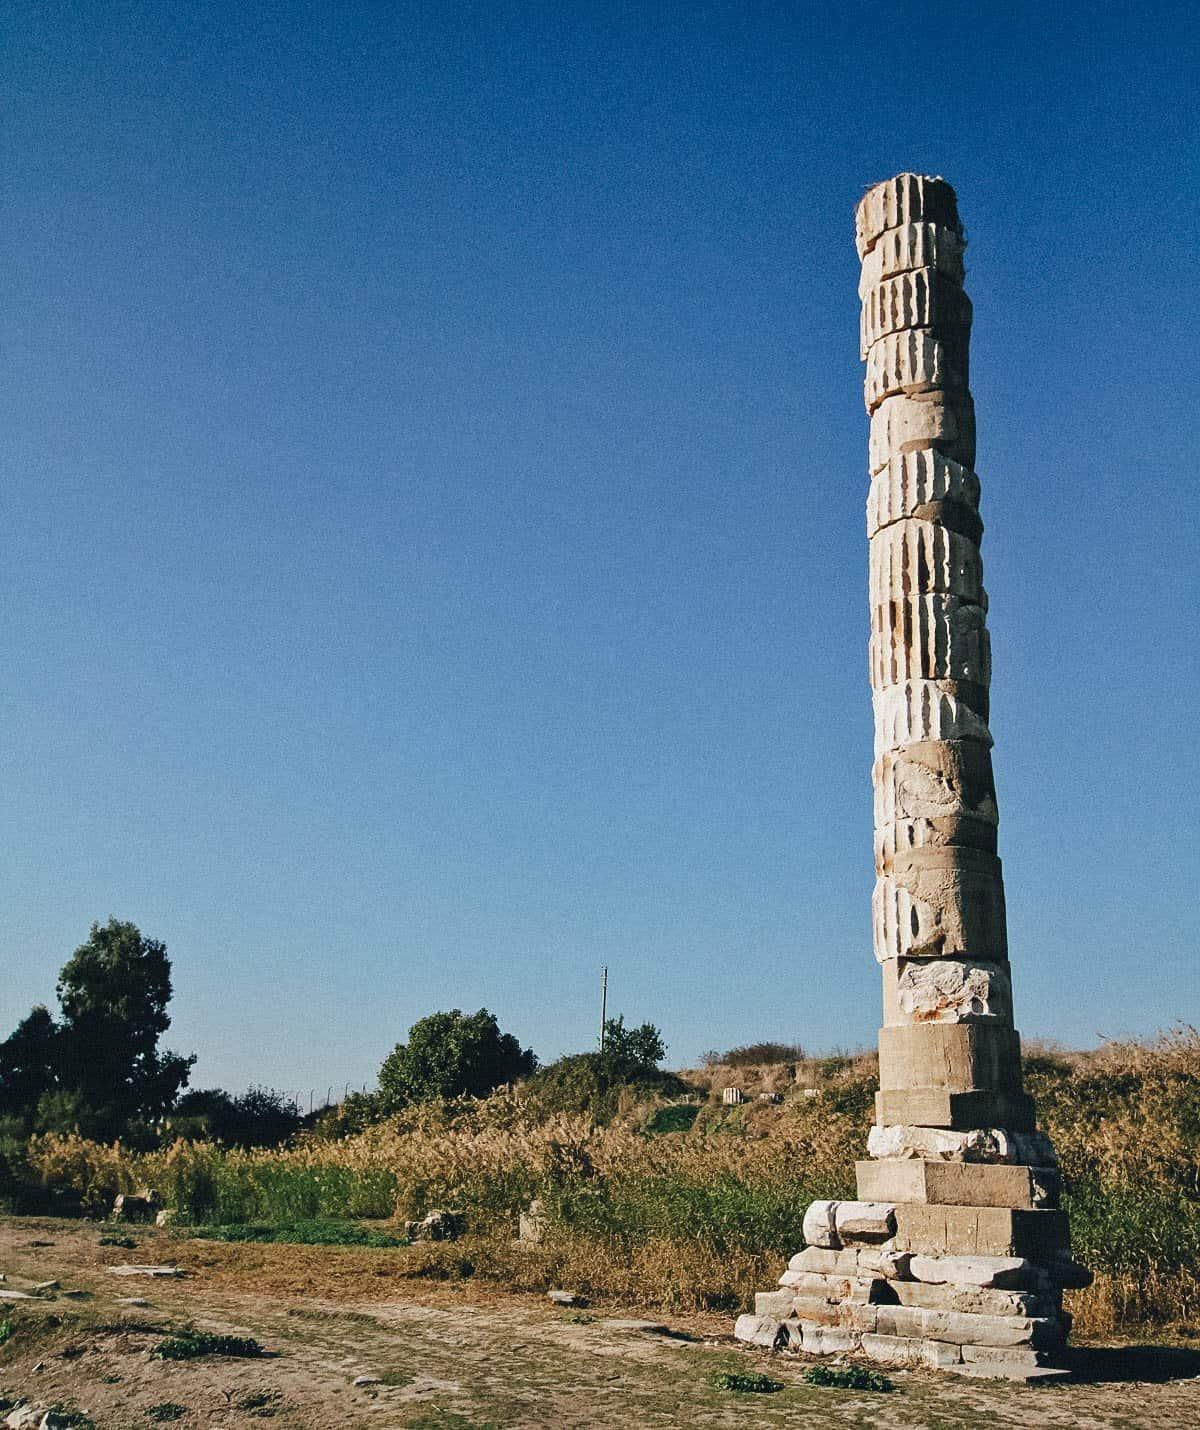 Temple of Artemis, Selçuk-İzmir, Turkey